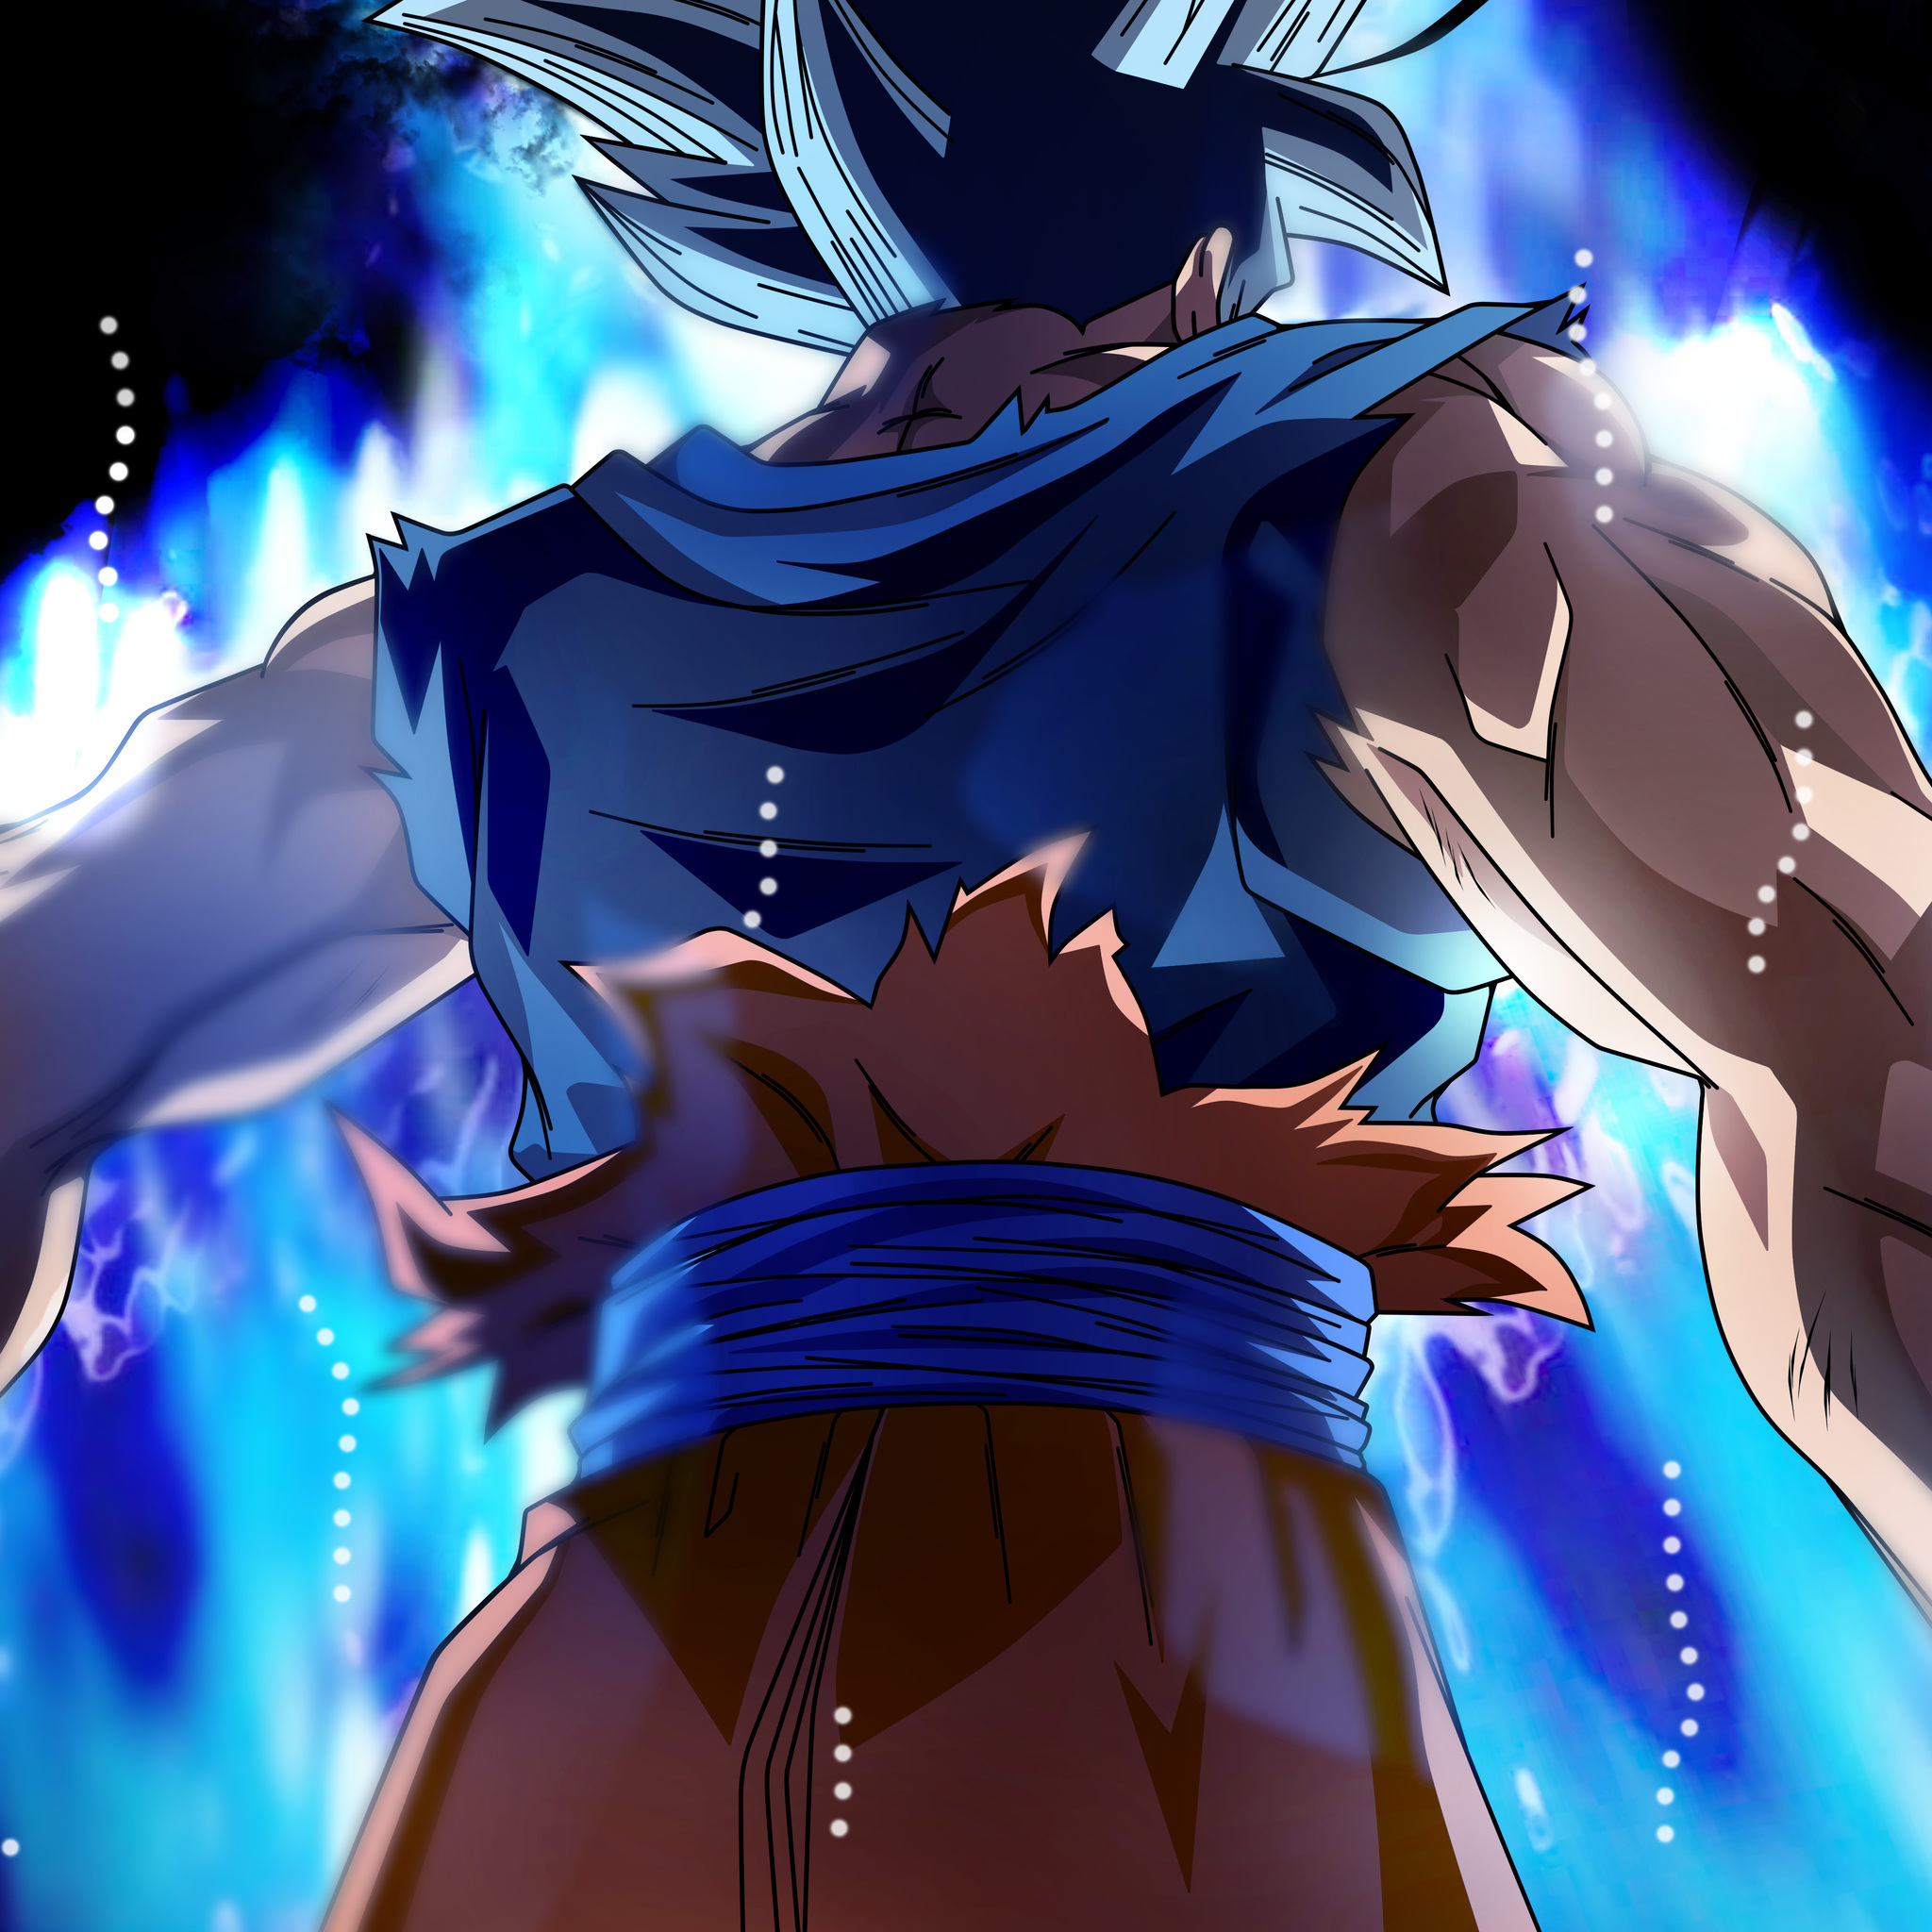 4k Wallpaper Dragon Ball: 2048x2048 Goku Dragon Ball Super 5k Anime Ipad Air HD 4k